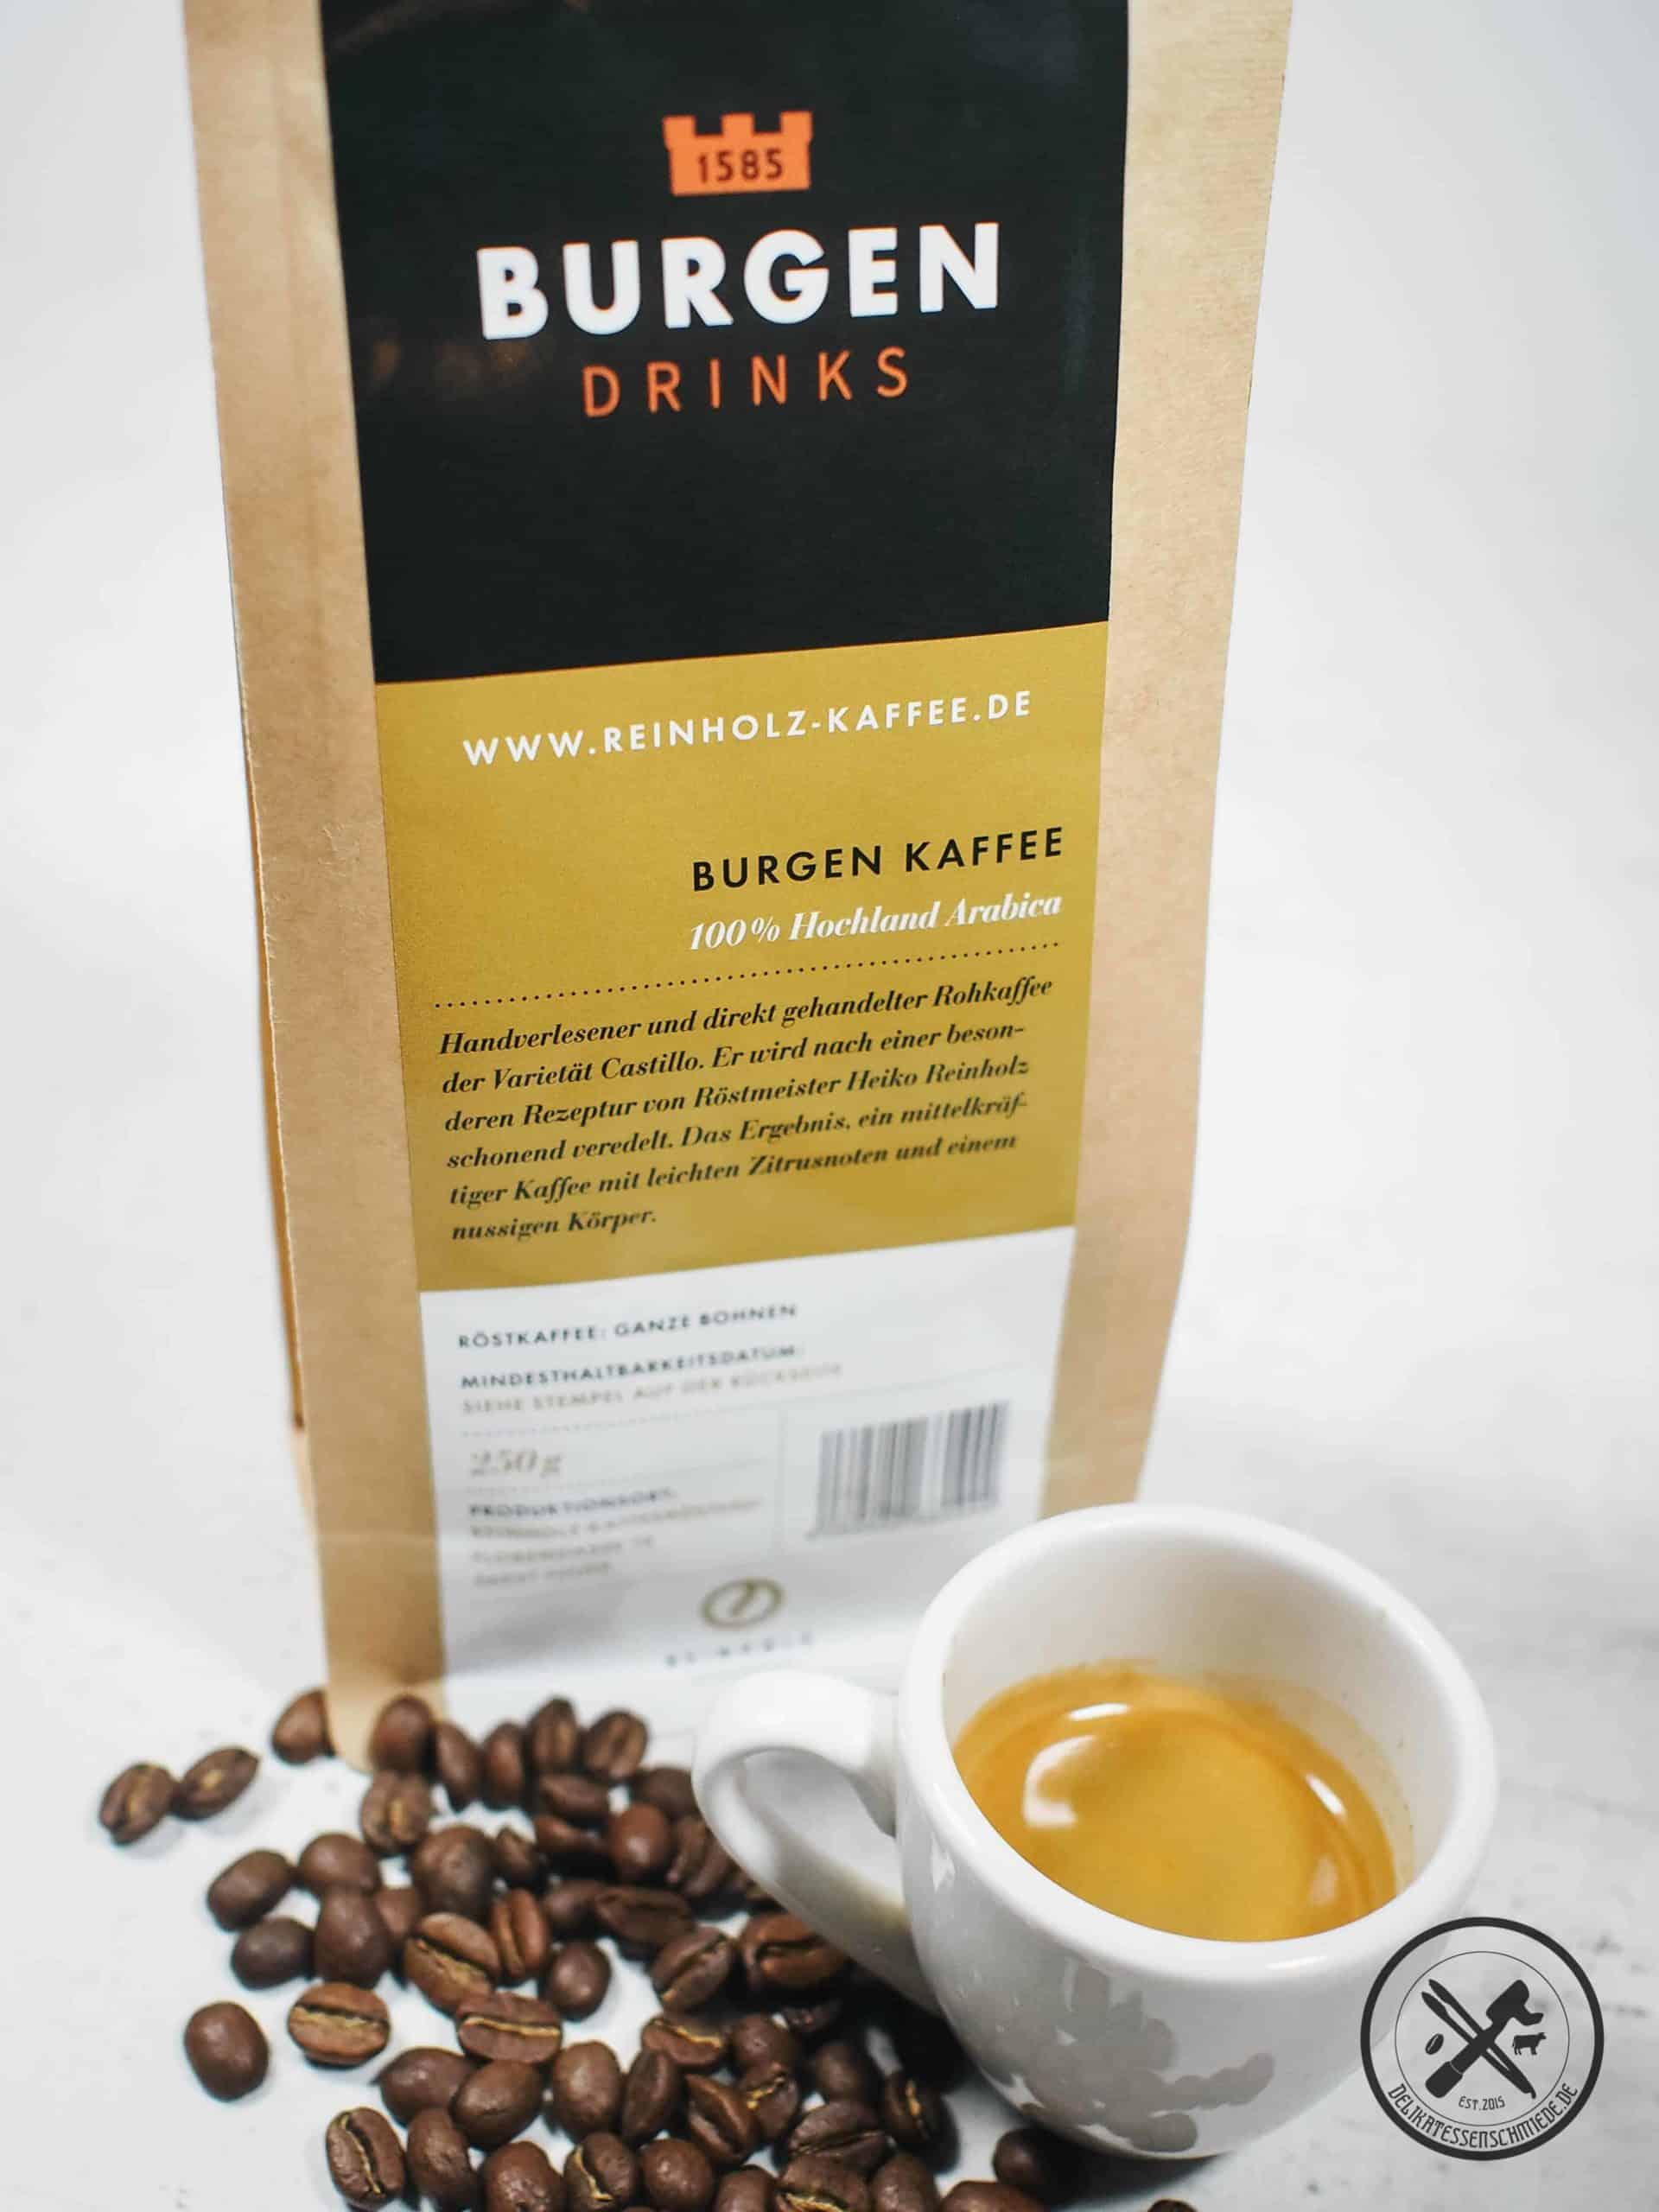 Burgen_Kaffee-5